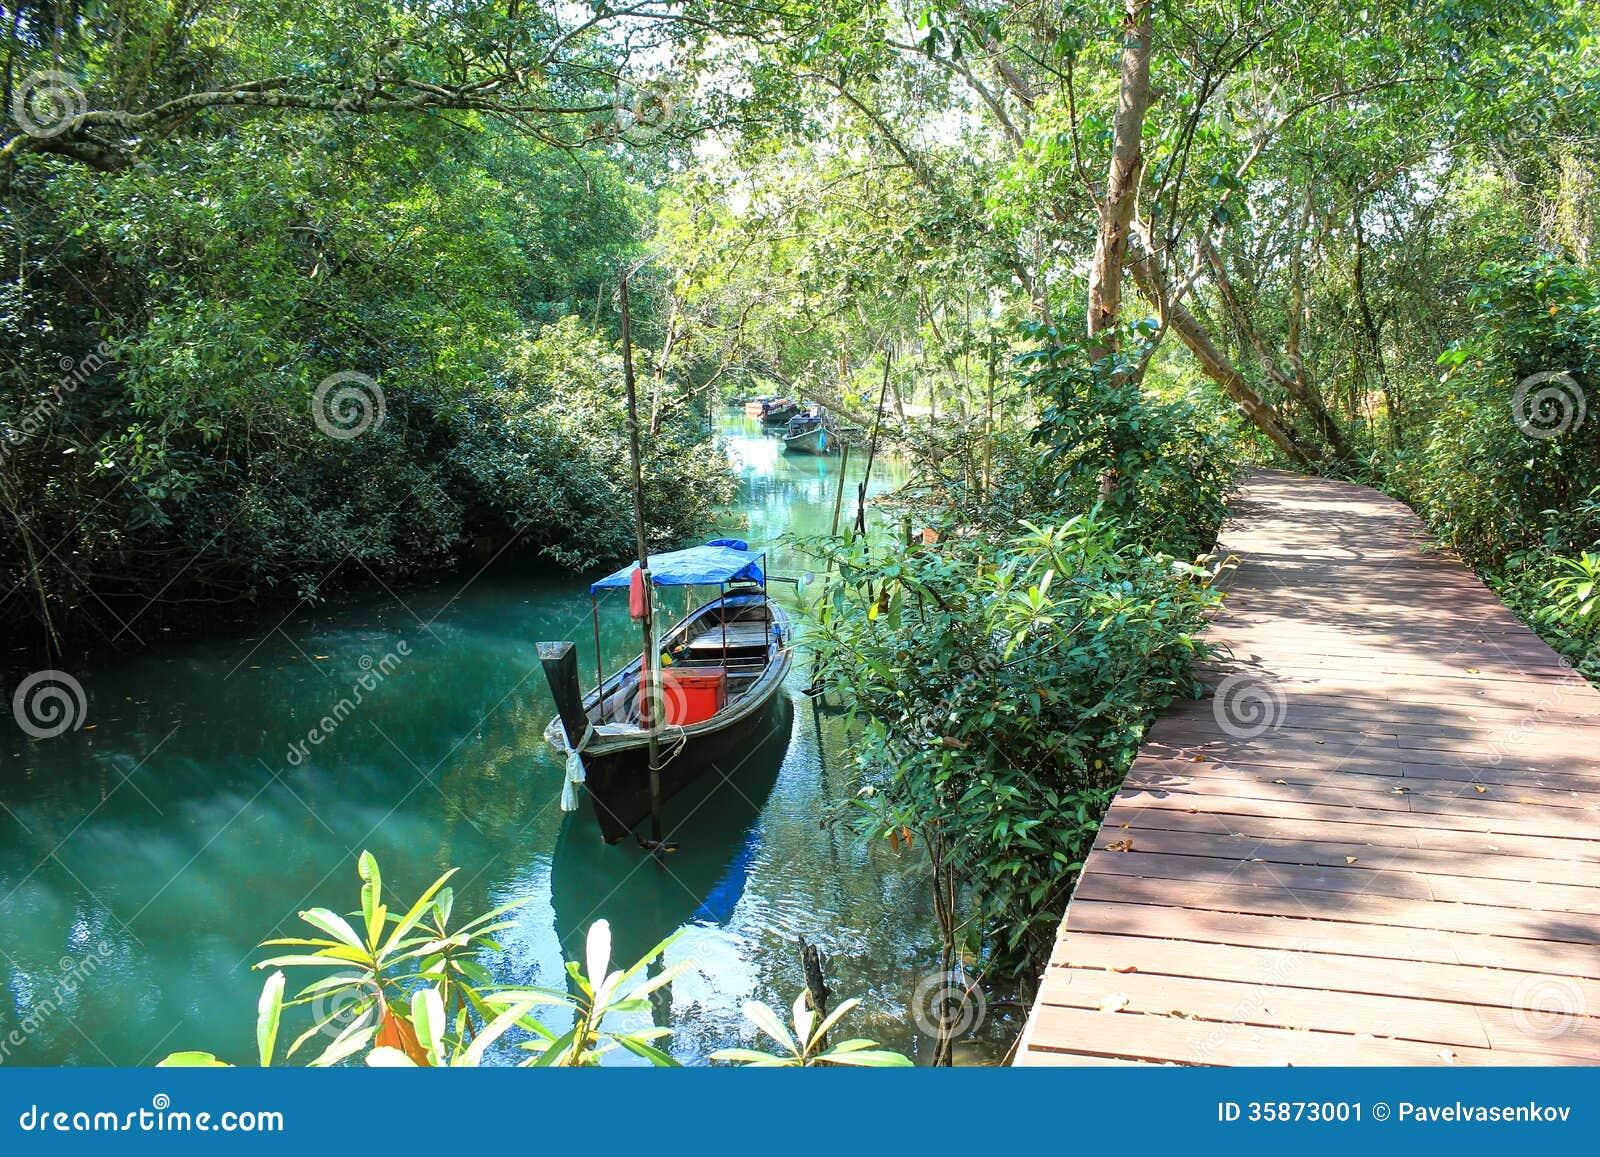 Blue Lagoon Krabi Thailand Stock Image Image 35873001